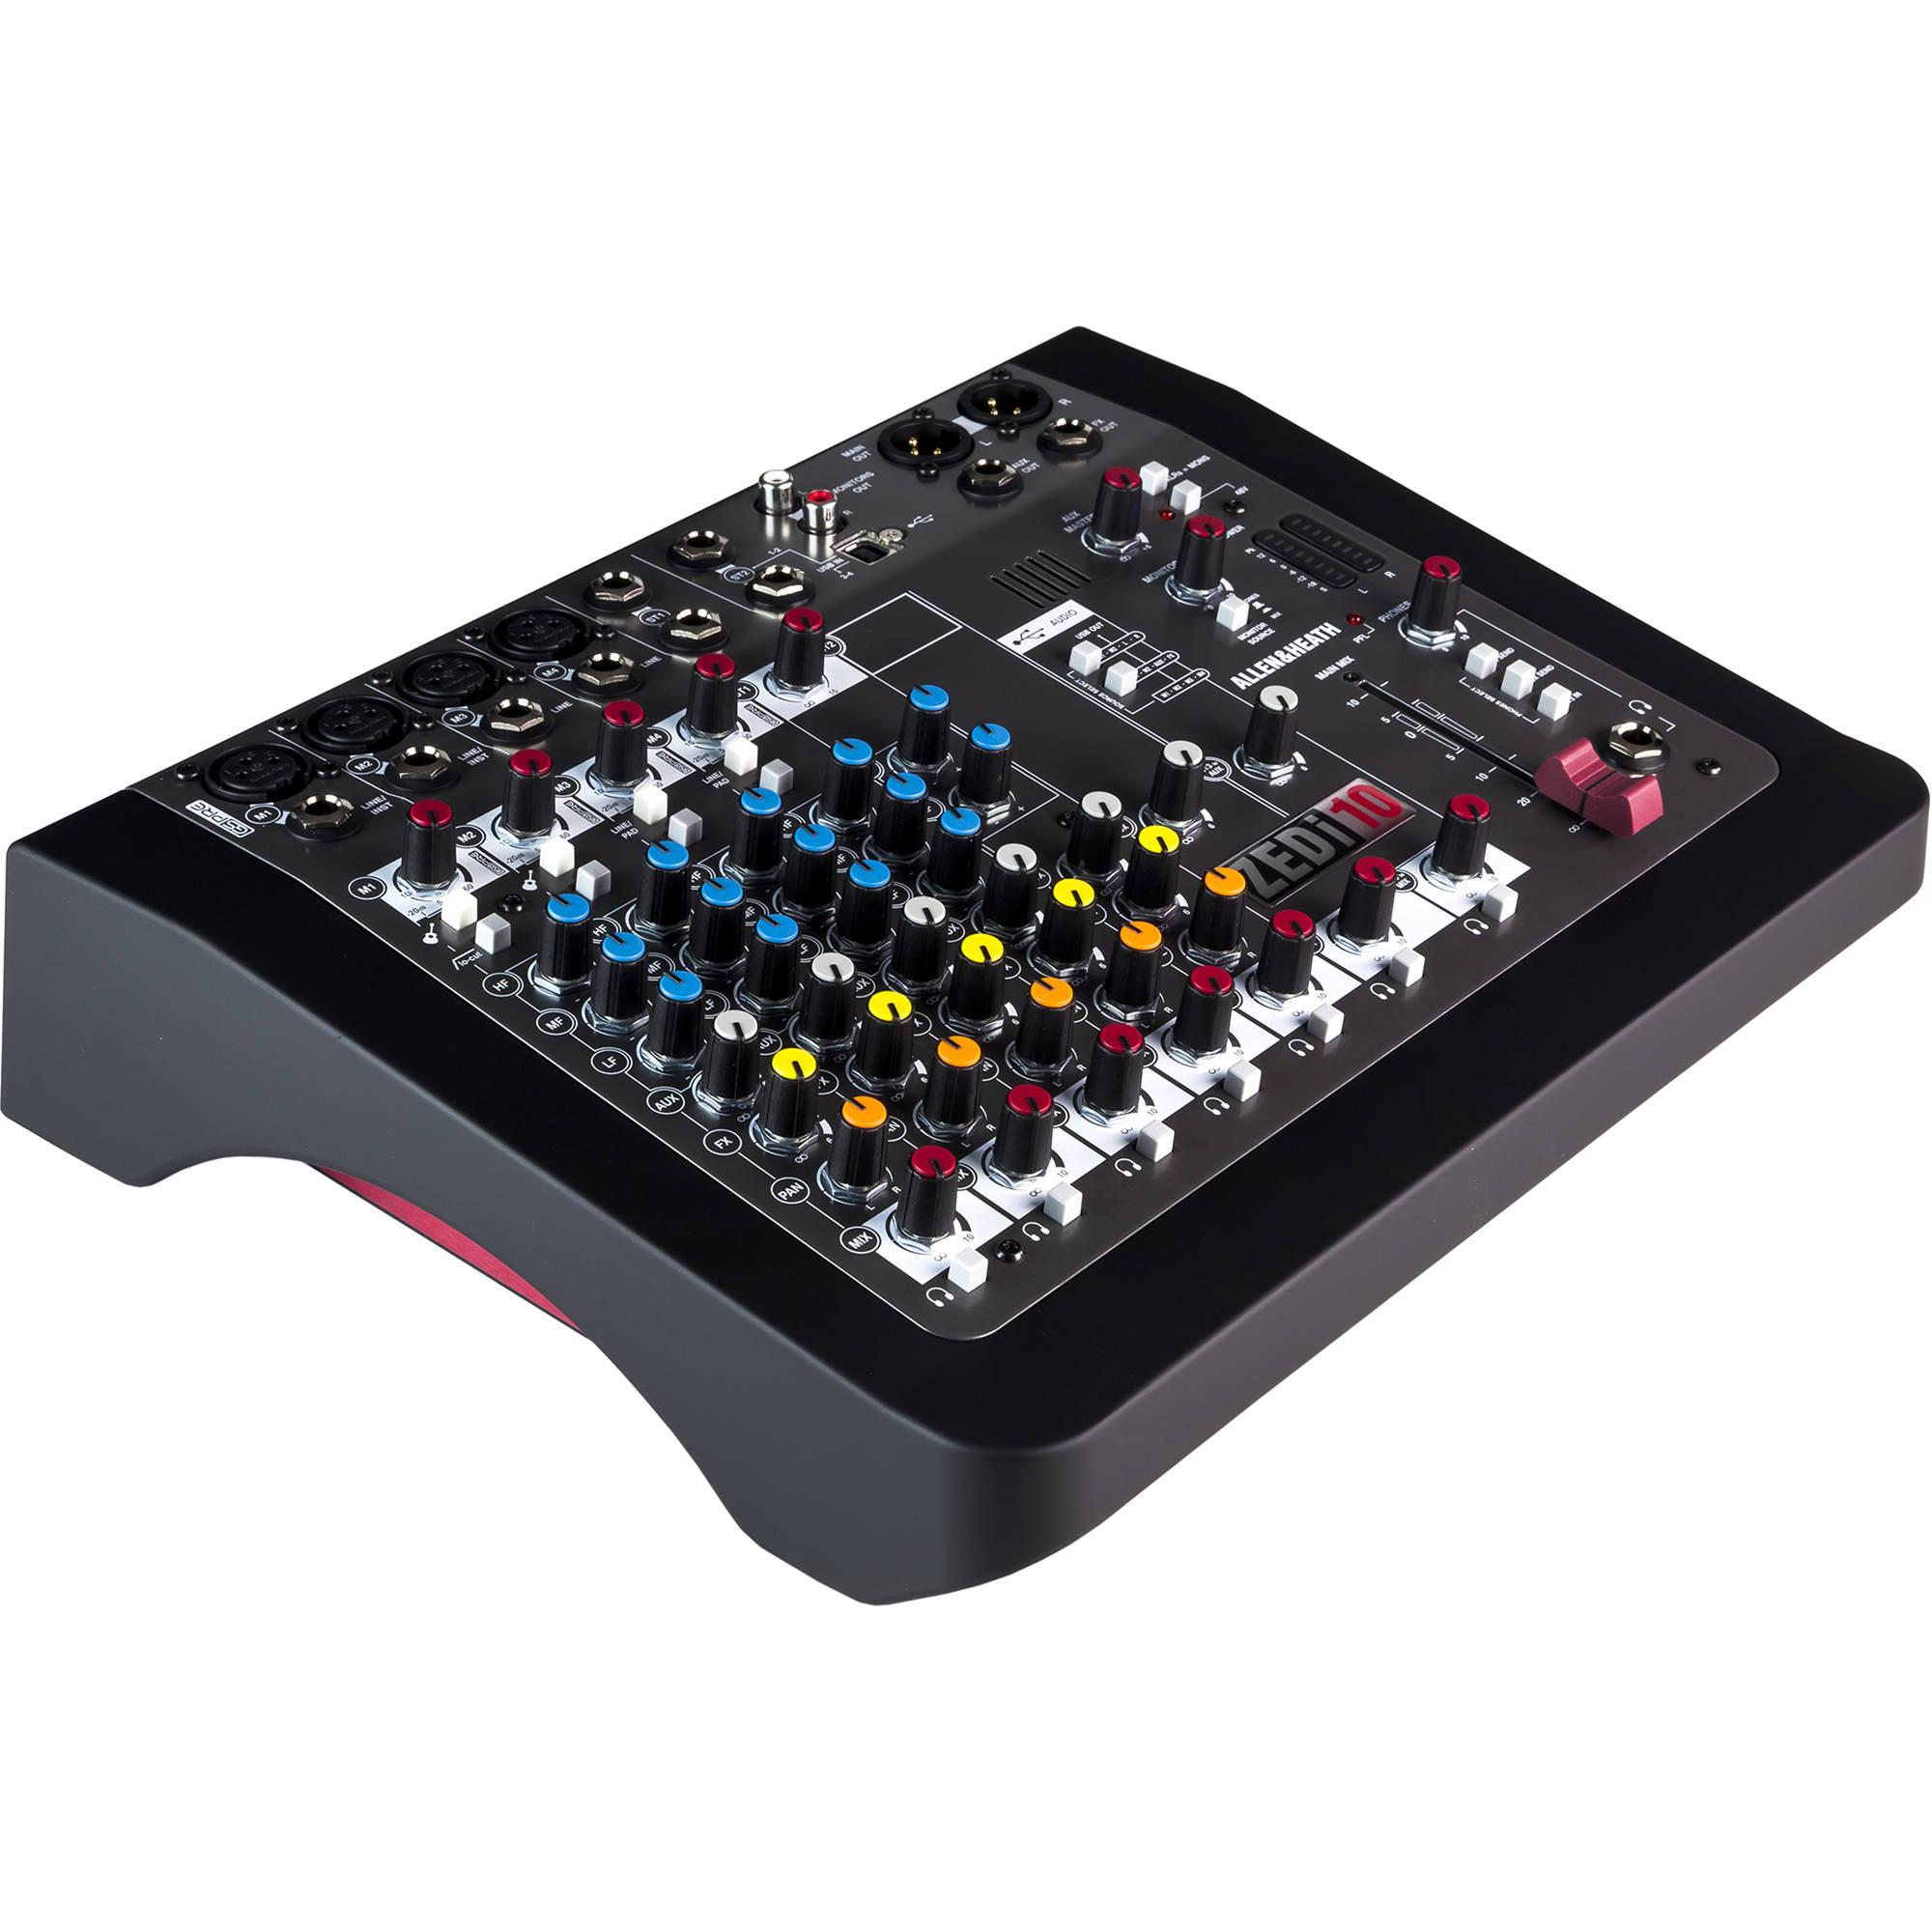 allen heath zedi 10 compact hybrid mixer usb interface. Black Bedroom Furniture Sets. Home Design Ideas